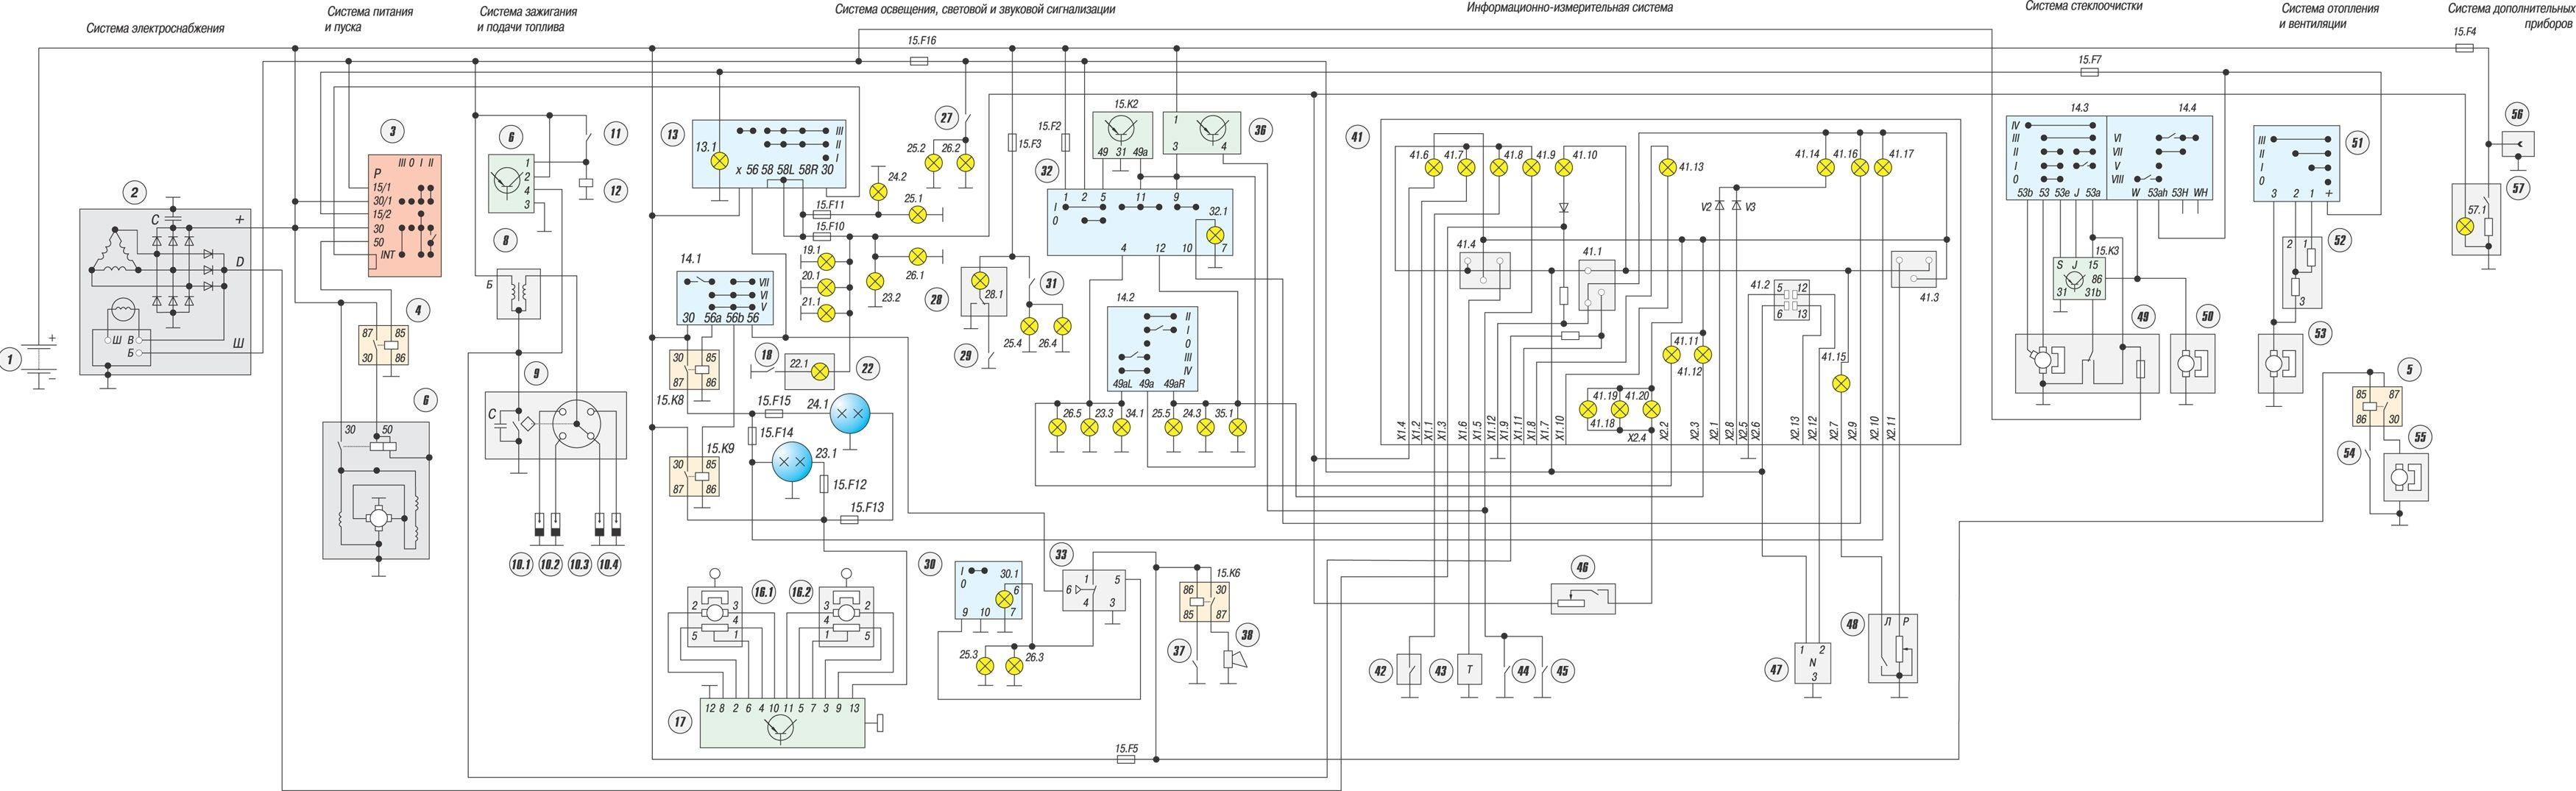 Схема электрооборудования иж 27175 инжектор 174